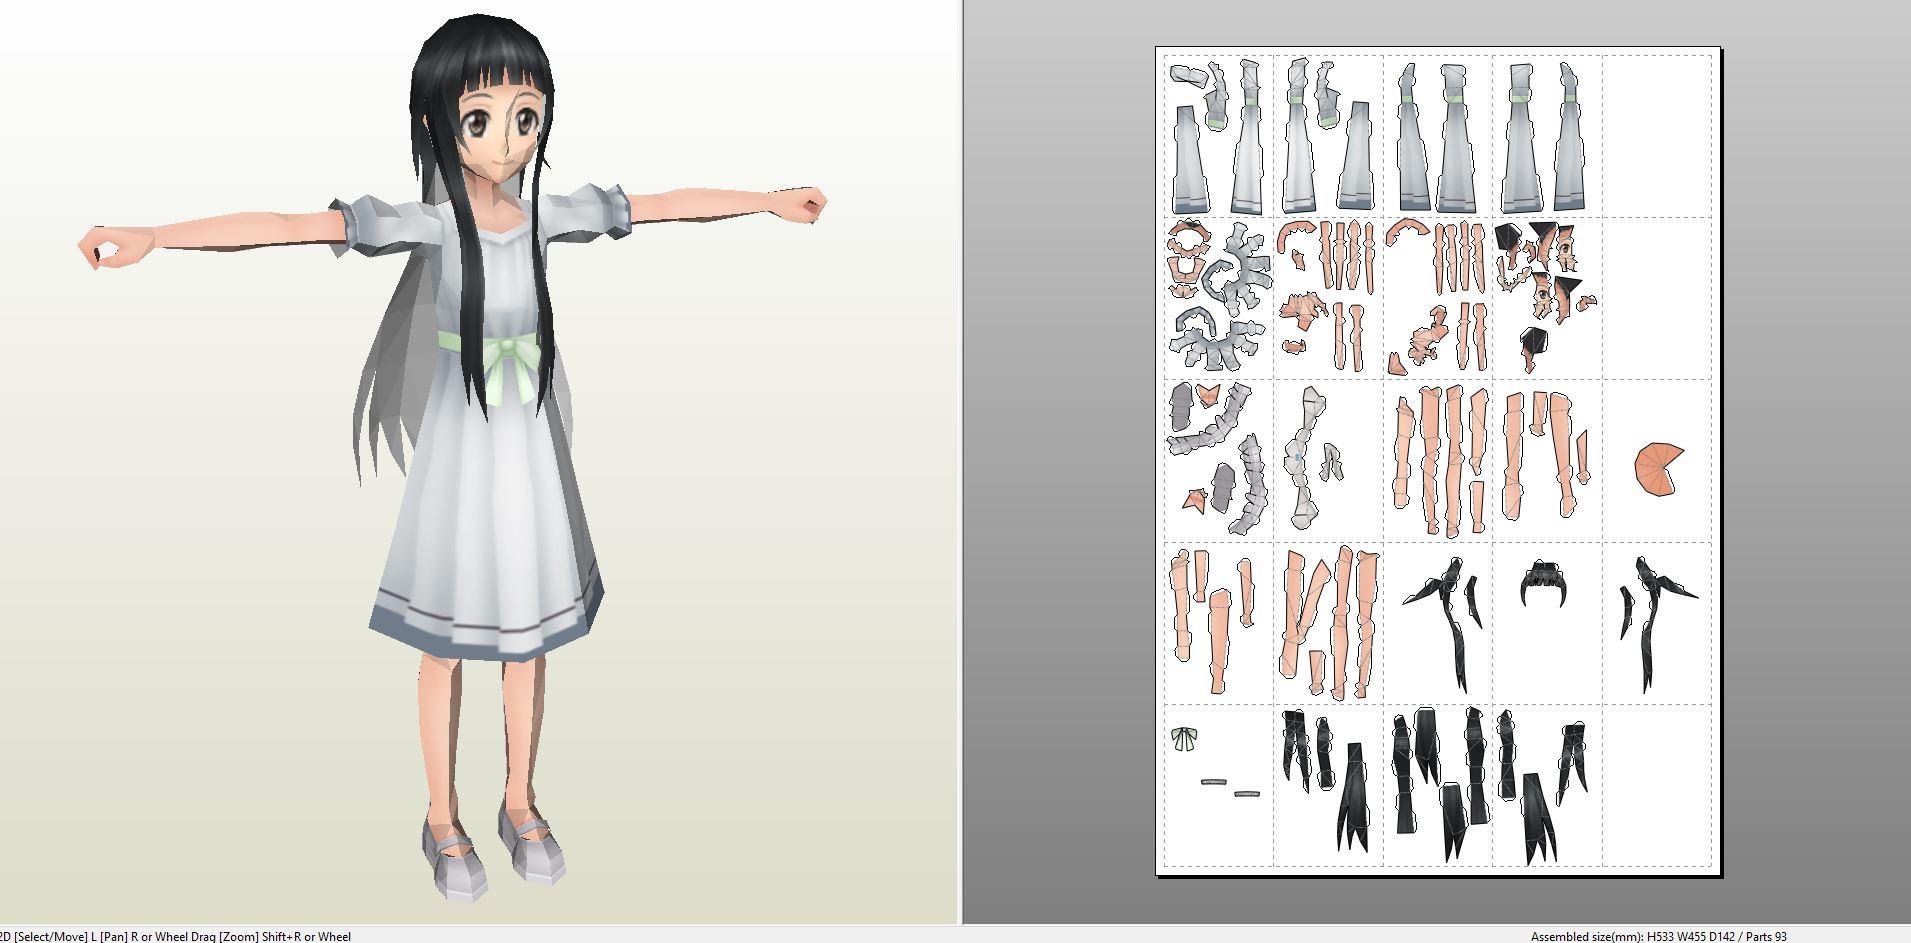 Papercraft .pdo file template for Sword Art Online - Yui V2.